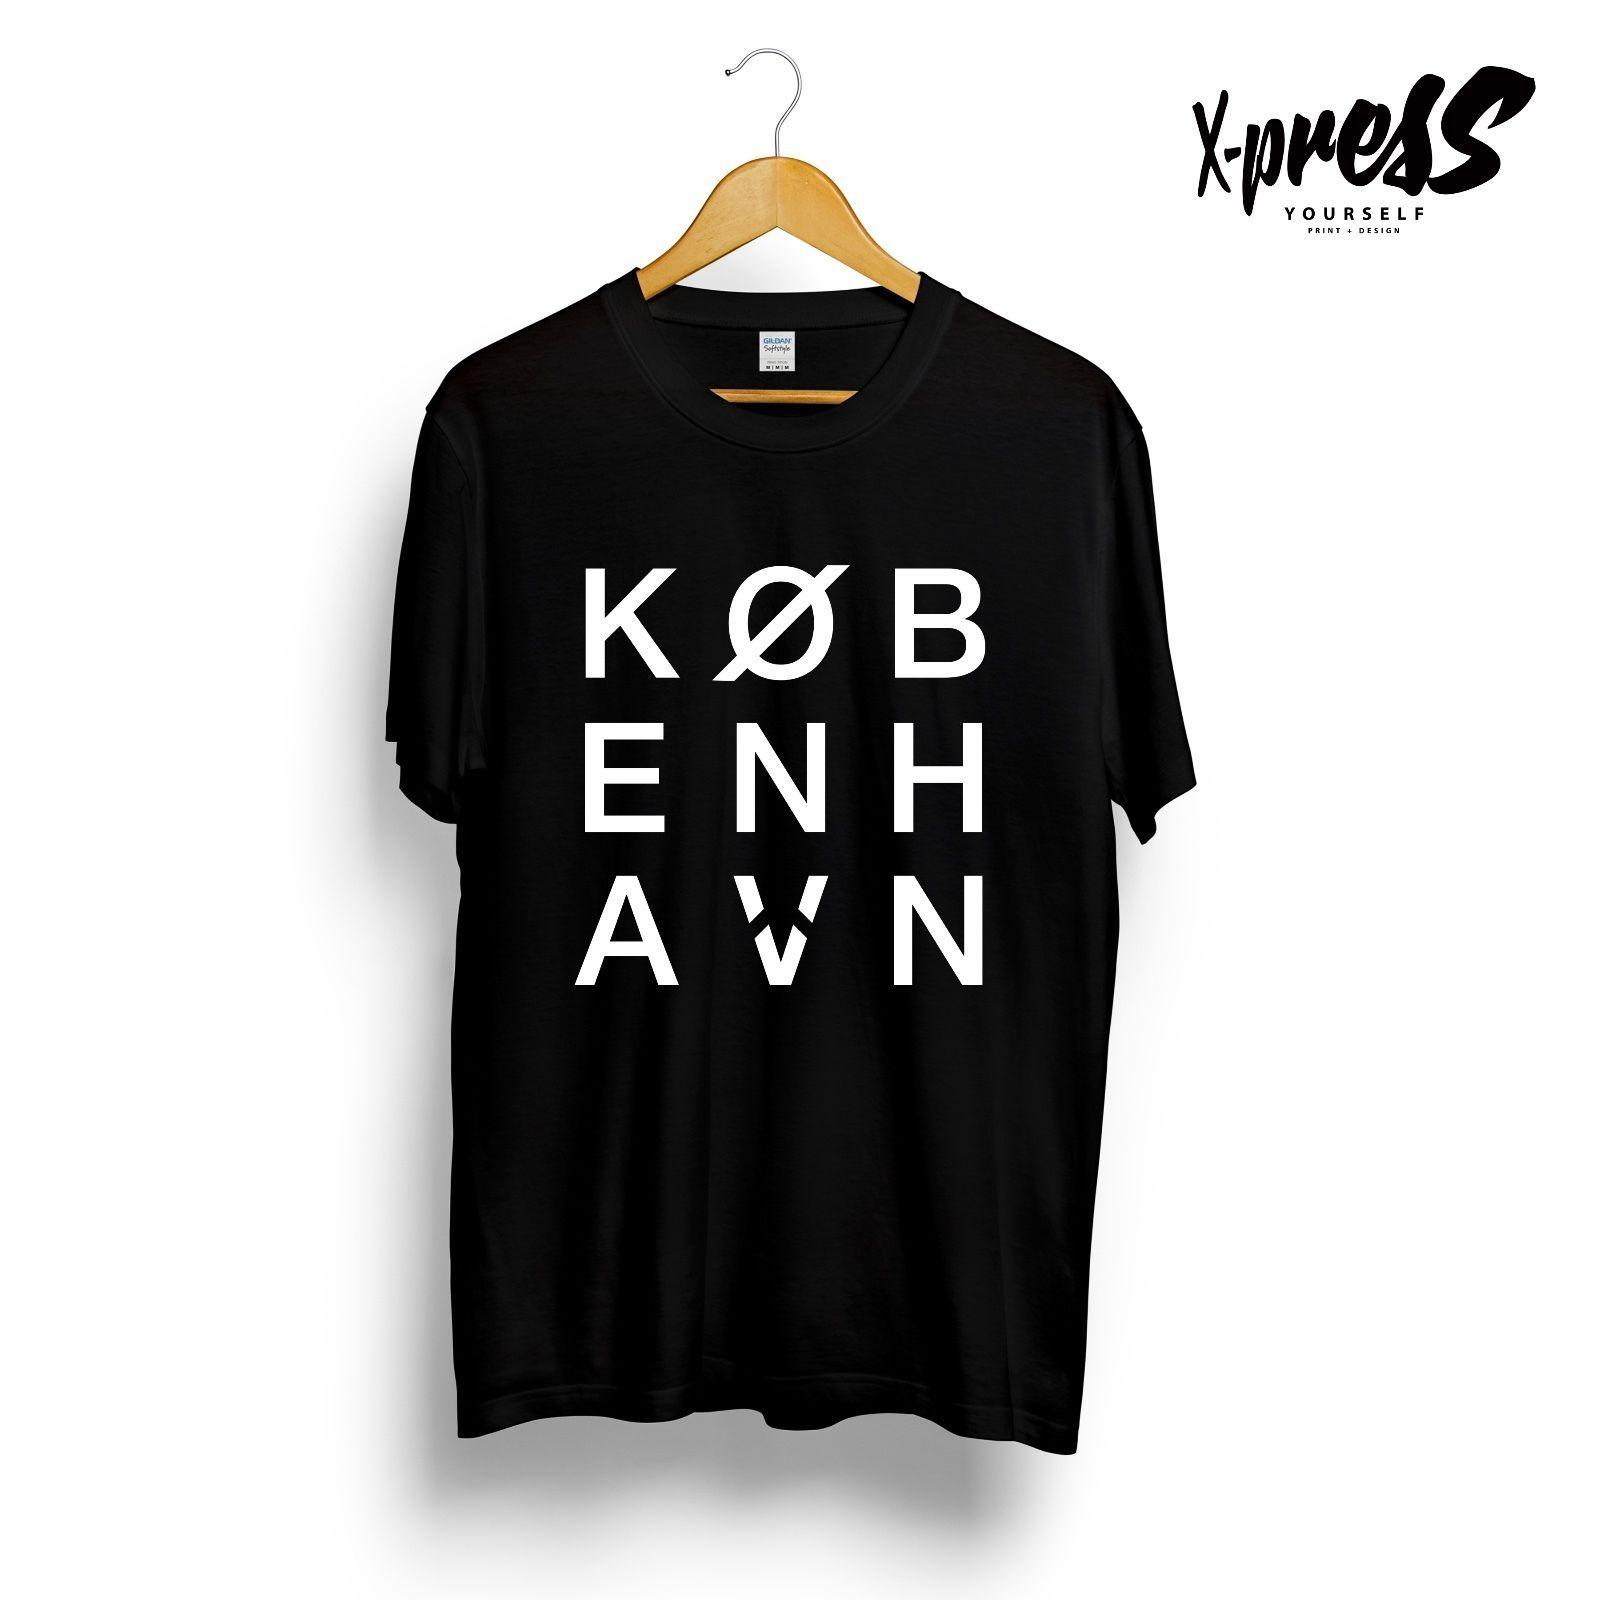 5005d3d7bb69 COPENHAGEN KØBENHAVN PRINTED TSHIRT GRAPHIC TYPOGRAPHY PRINT BLACK WHITE TEE  TOP Size Discout Hot New Tshirt Denim Clothes Camiseta T Shirt Create T  Shirt ...